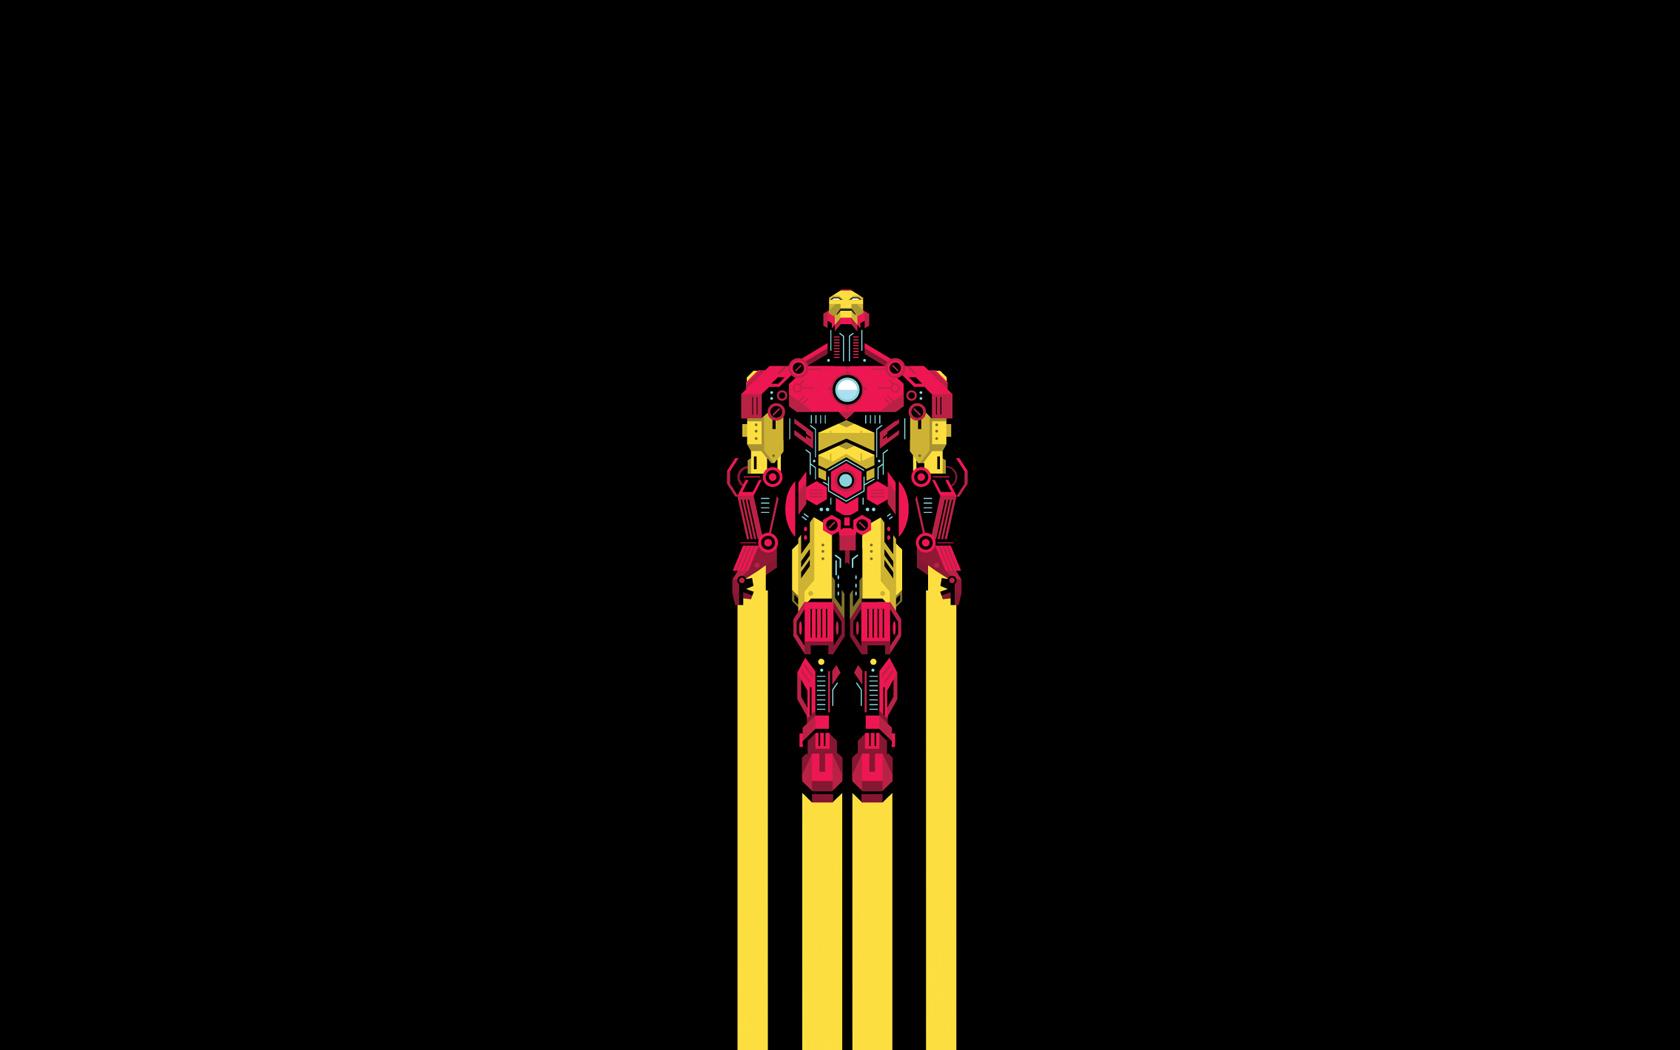 Minimalist Superhero Wallpapers Iphone Minimal heroes by bunka 1680x1050